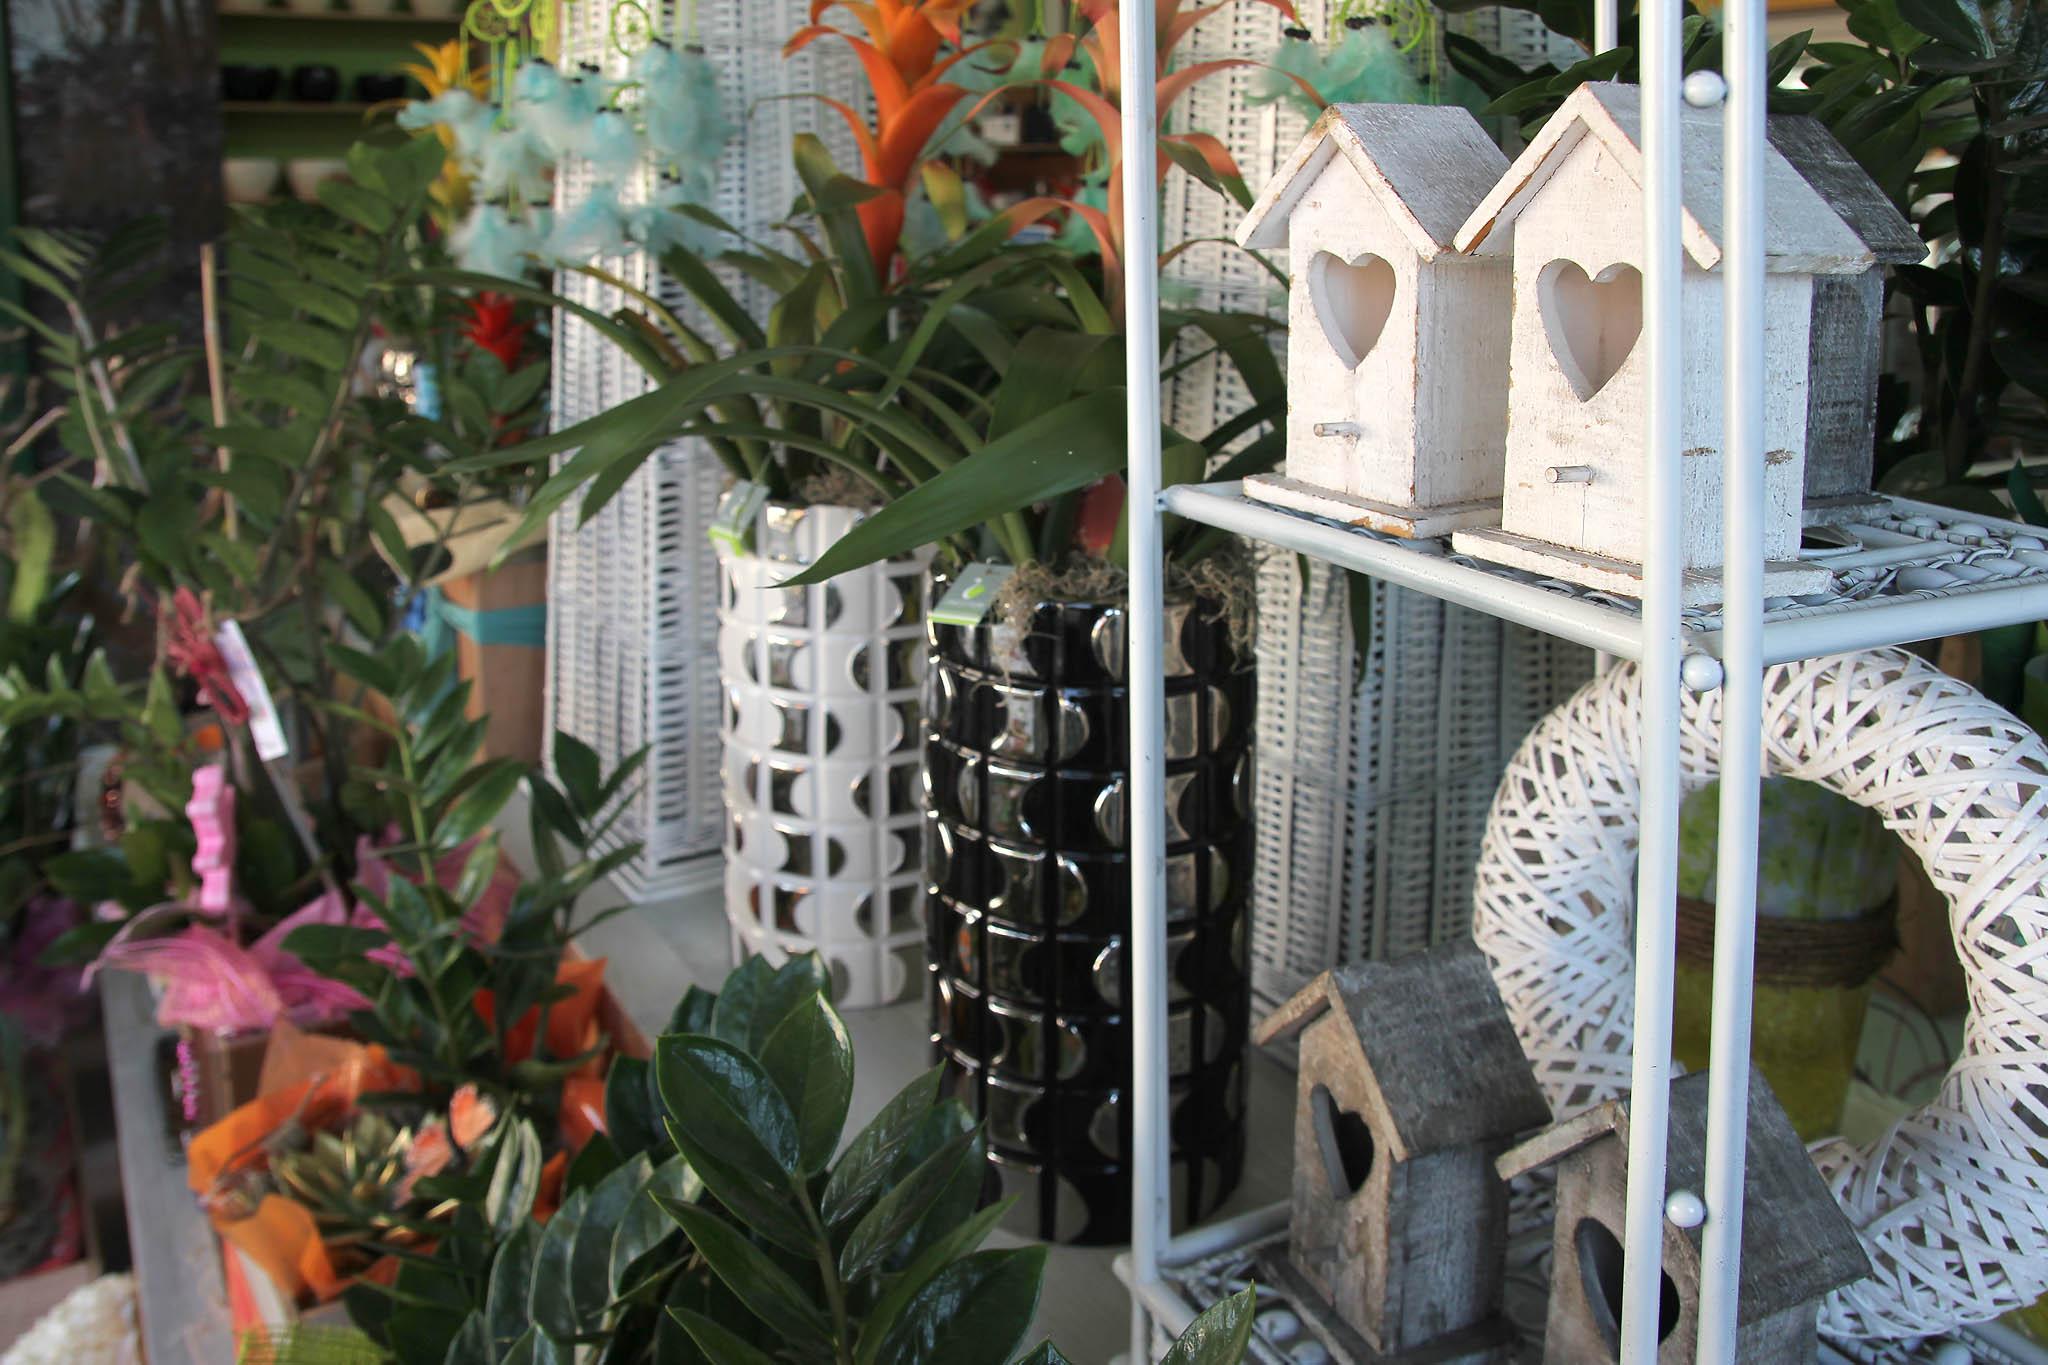 Unico Fiori flower shop